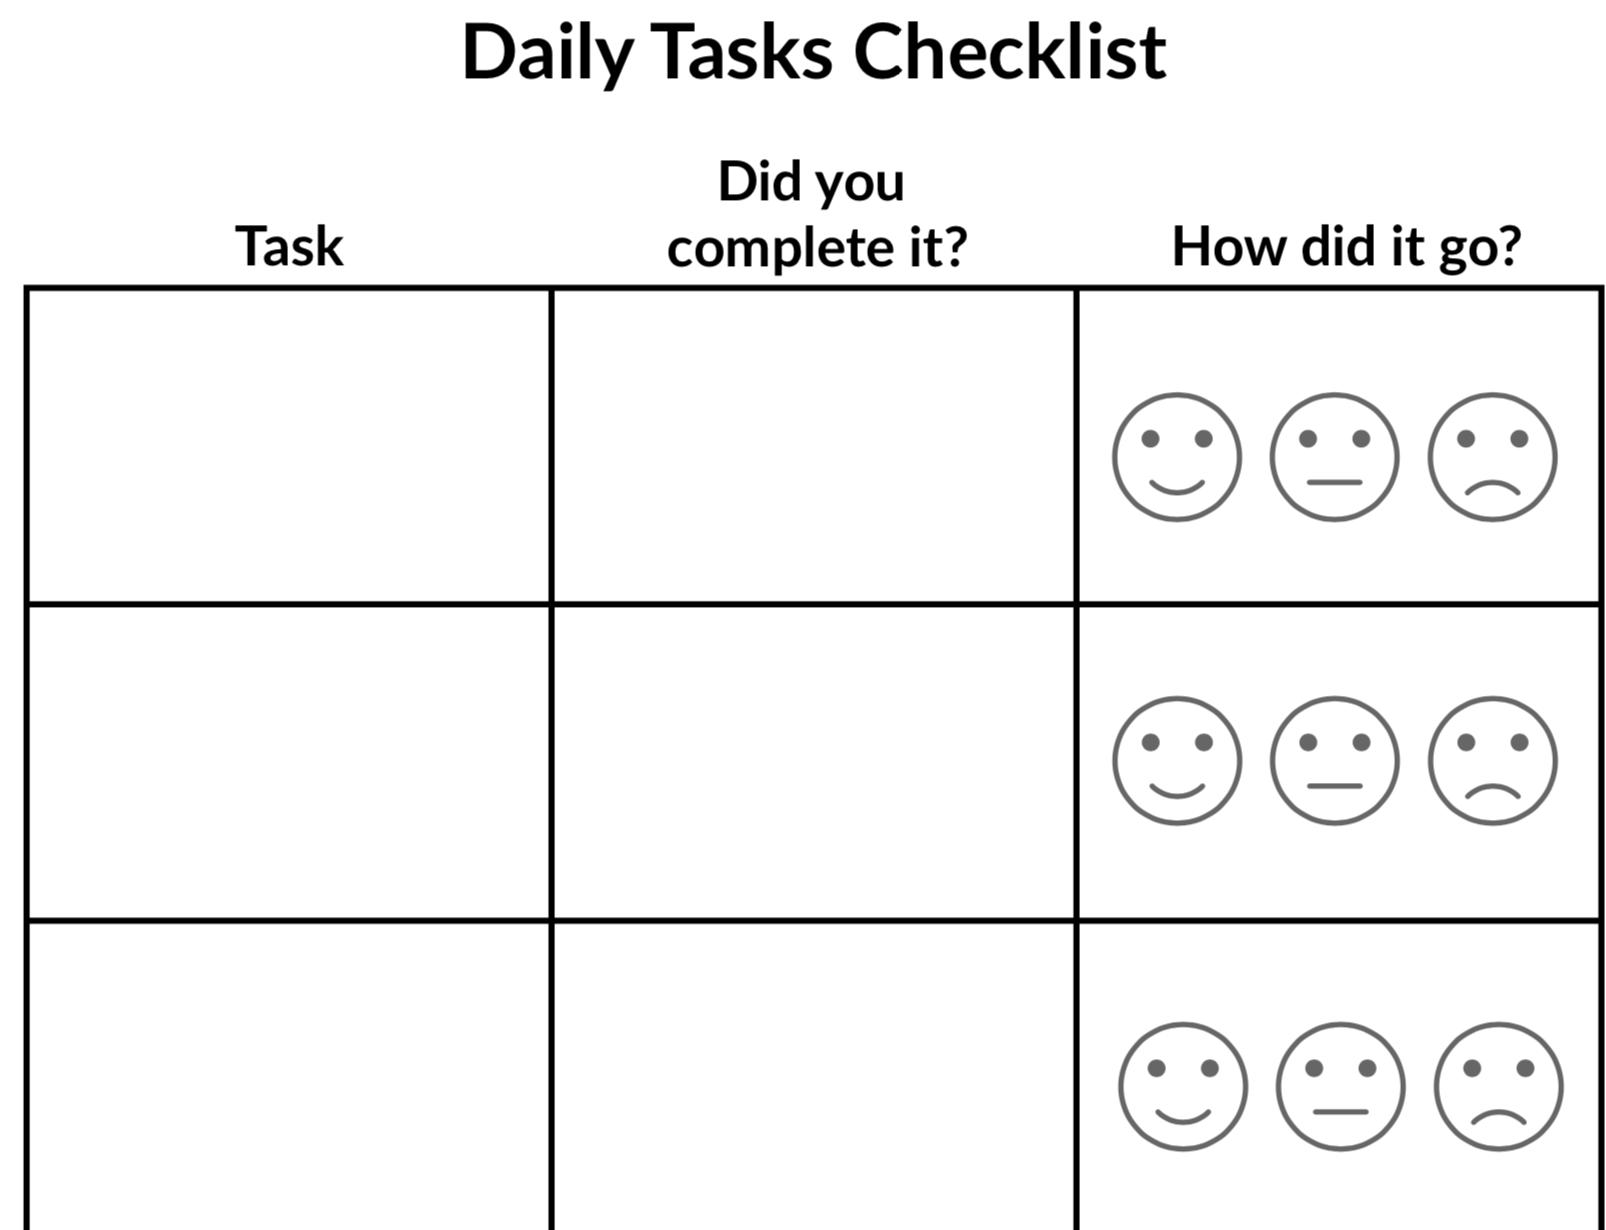 Daily Tasks Checklist Image